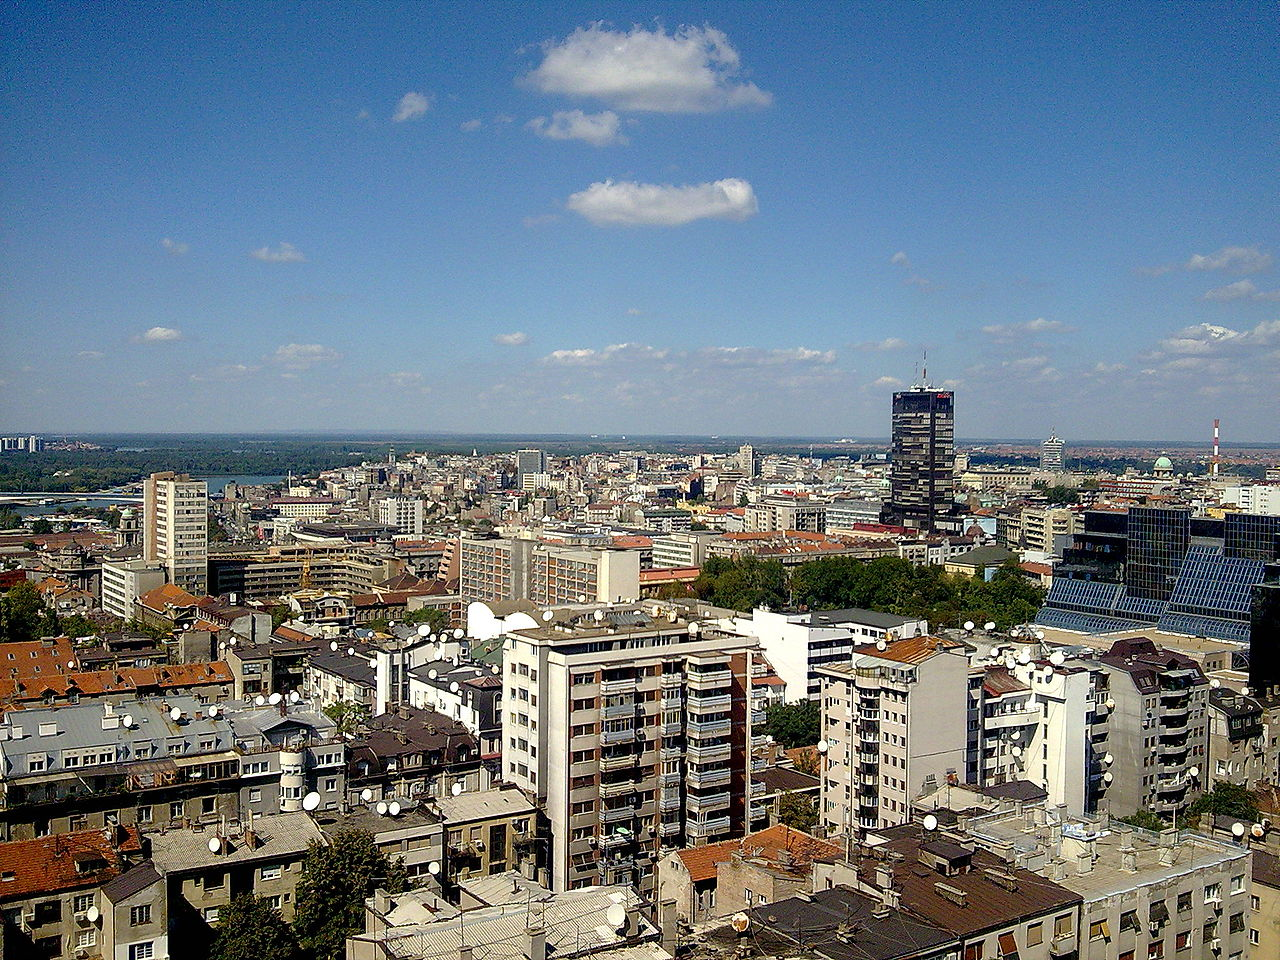 Belgrade (Image by Bobik/CC BY SA 3.0)